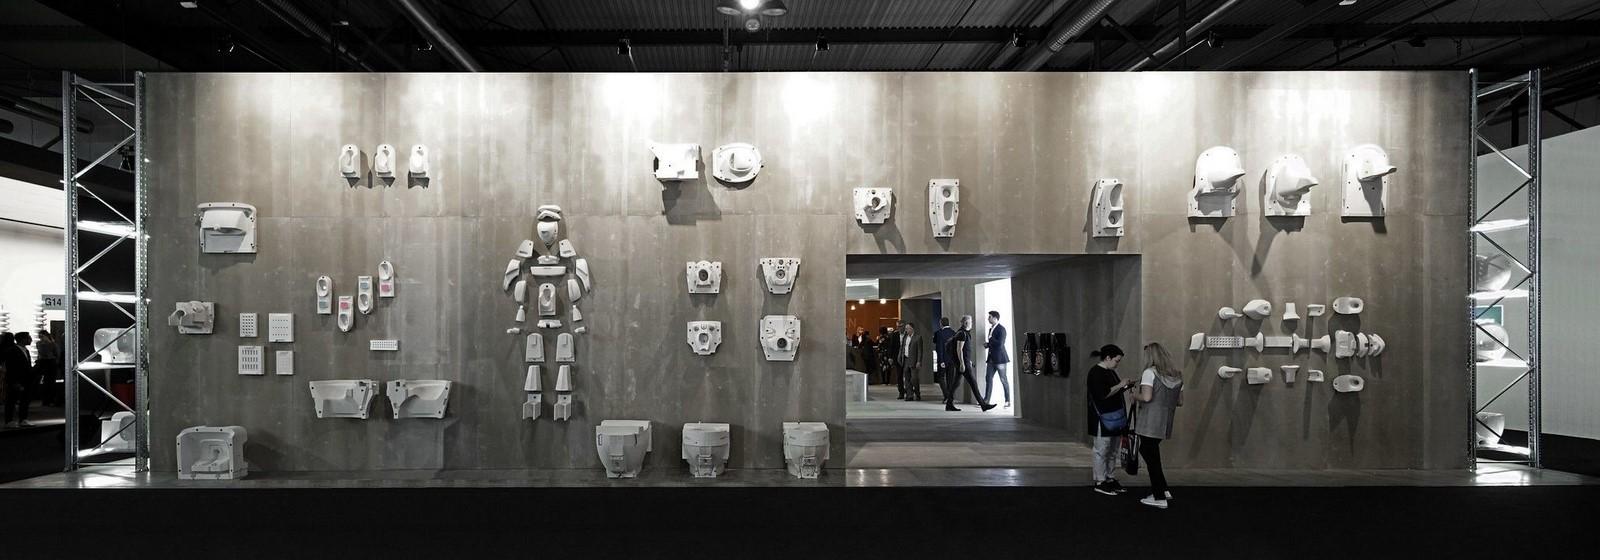 Showroom Laufen Bathrooms at Salone del Mobile, Milano, 2018 - Sheet1